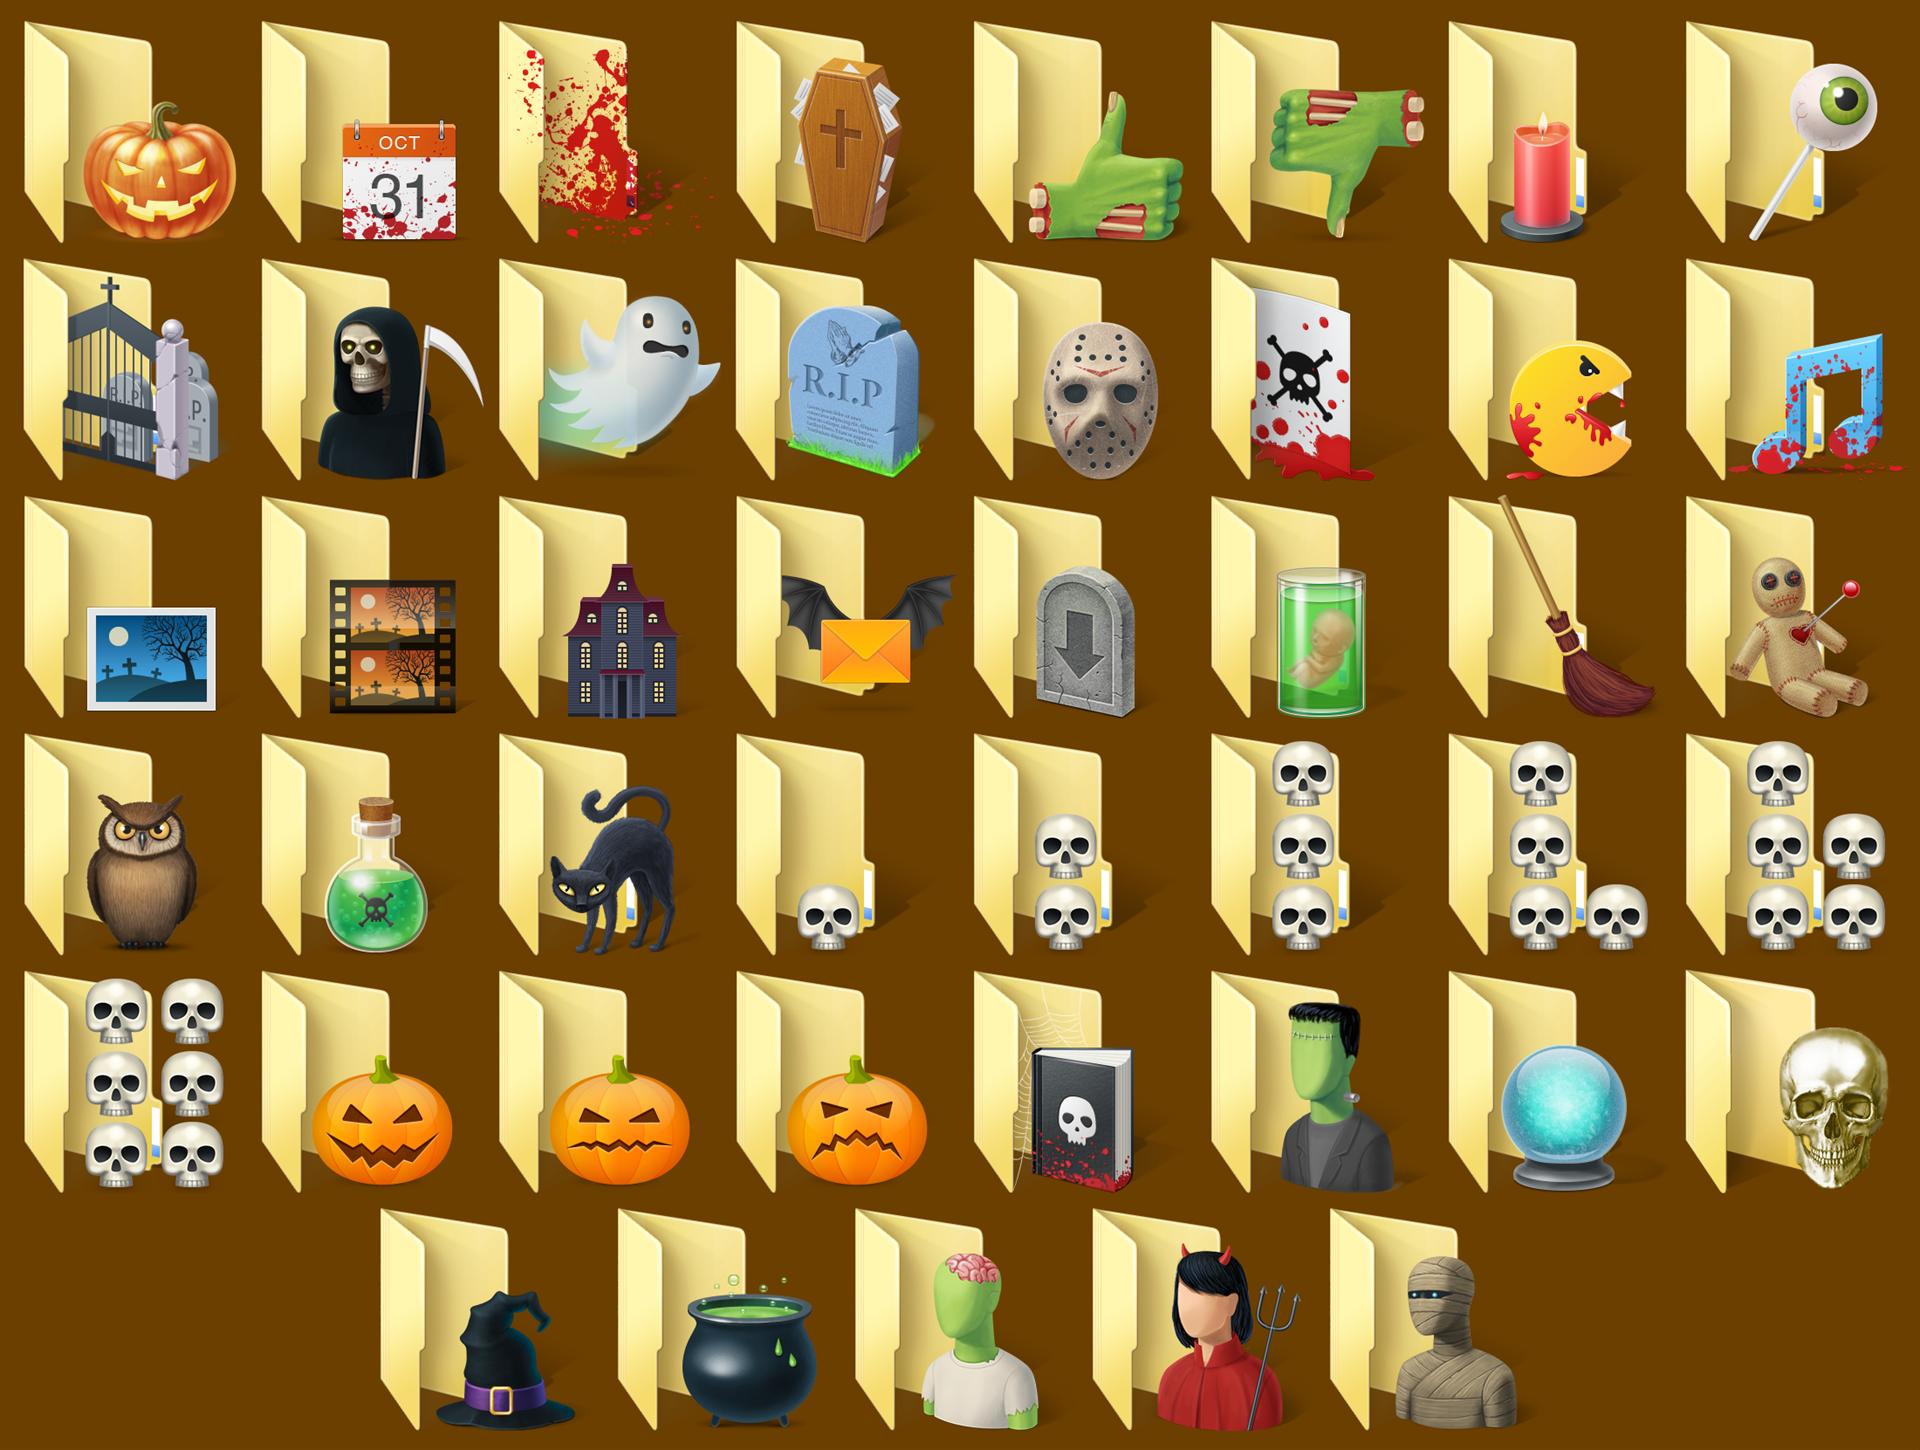 Folder Marker Pro + Halloween Folder Icons Bundle Screenshot